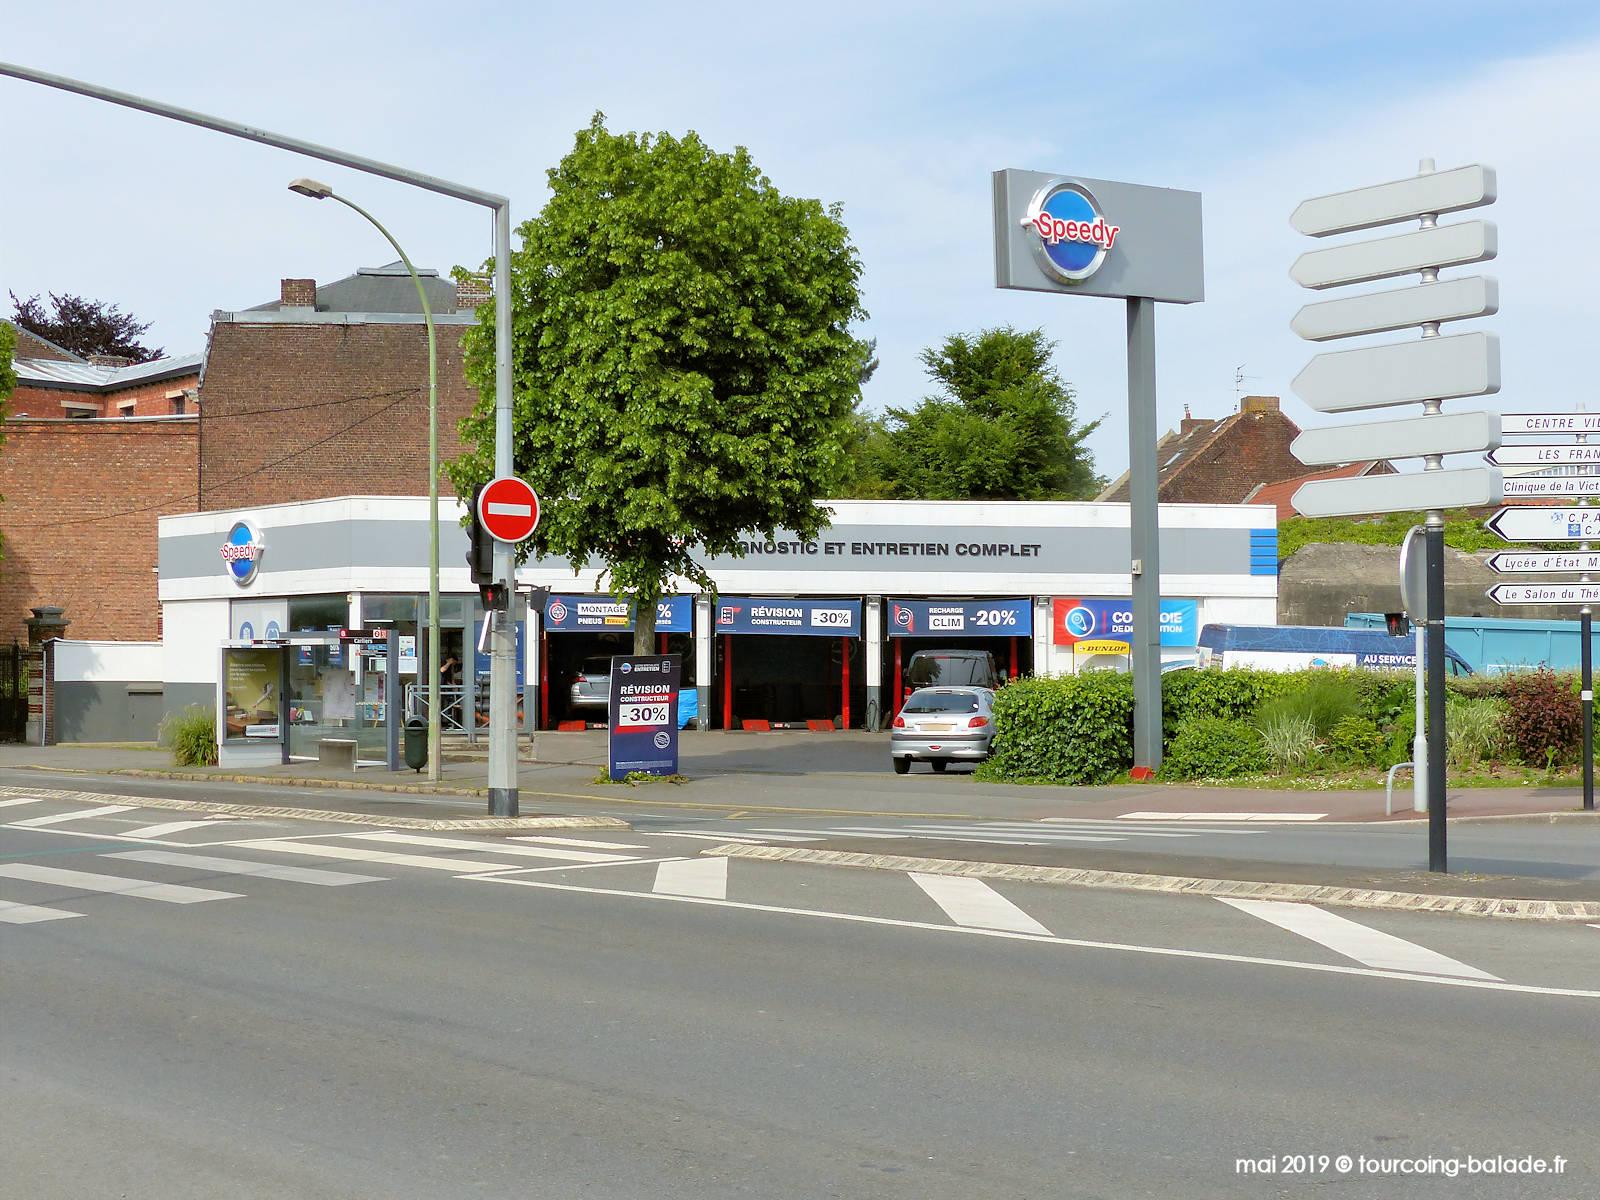 Speedy Tourcoing - Boulevard Gambetta, 2019